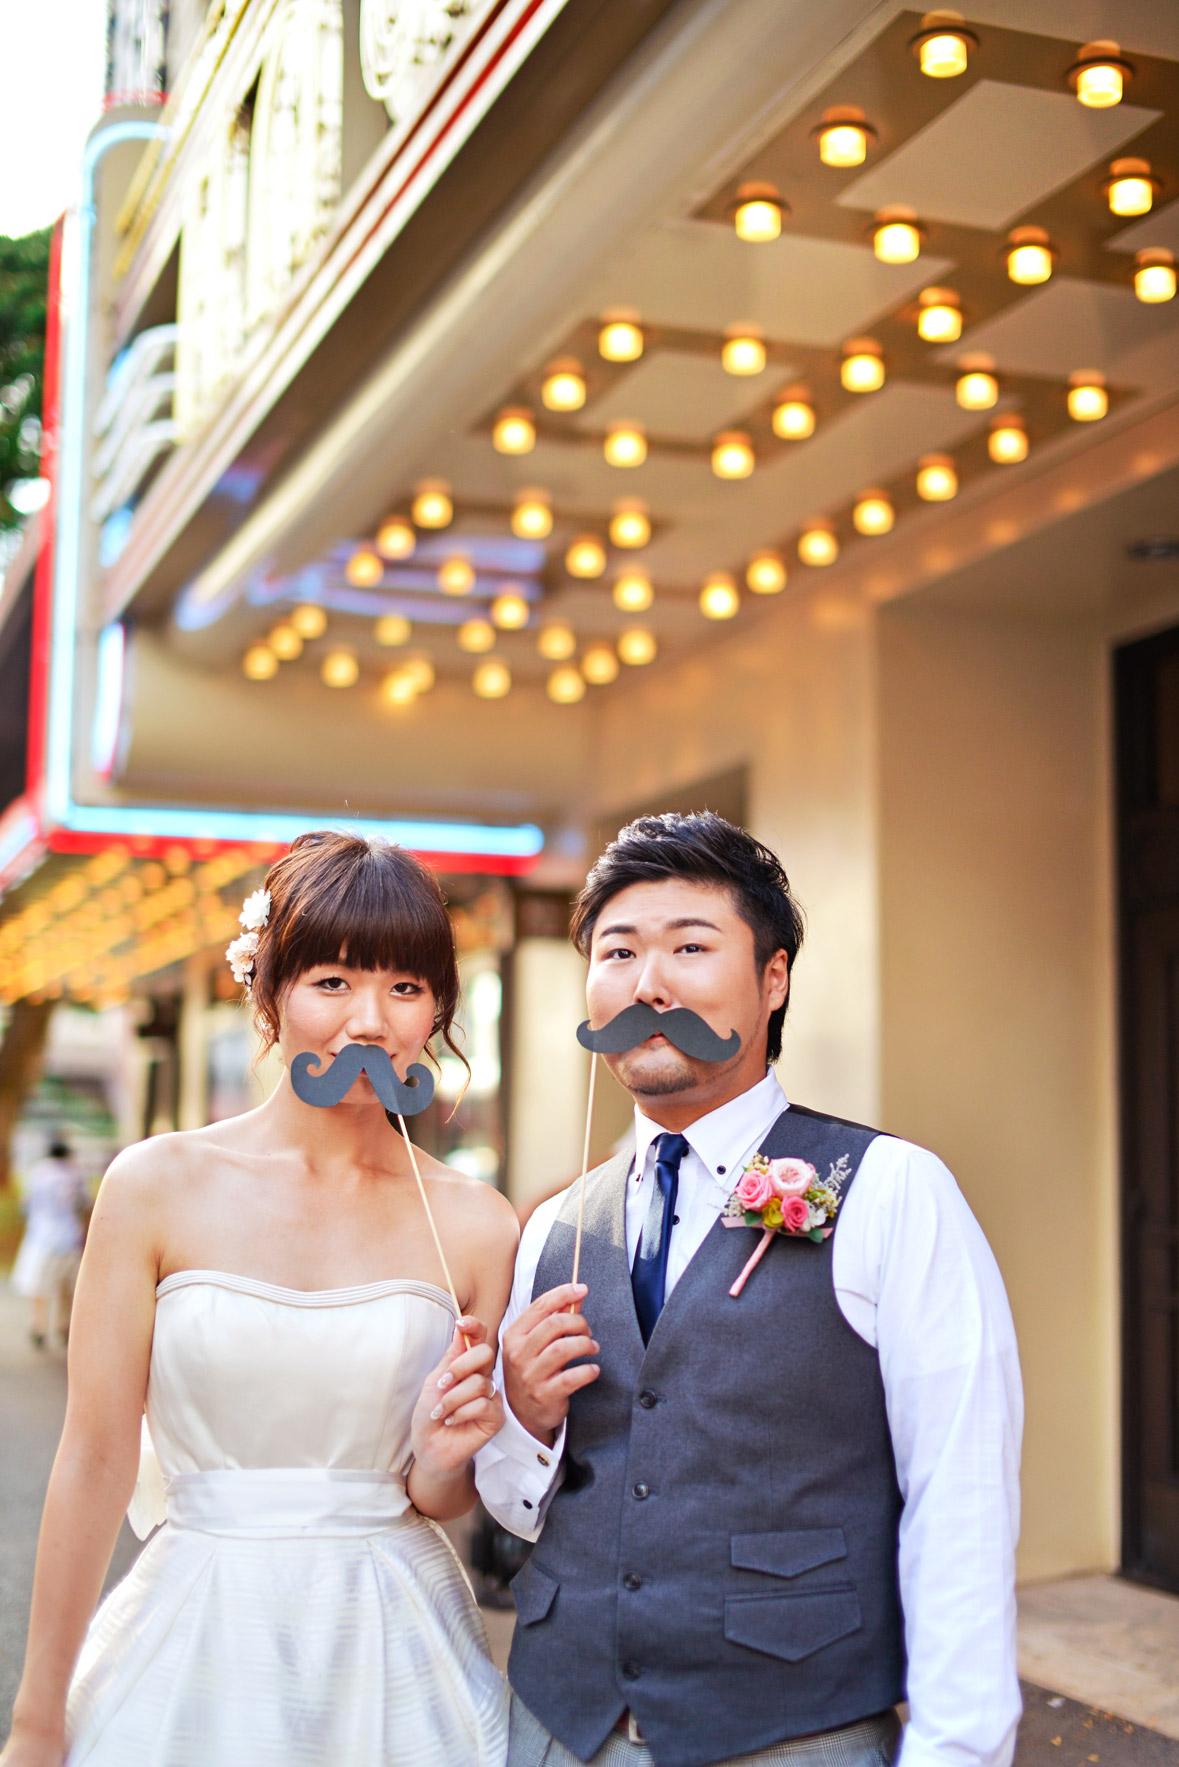 waikiki-beach-wedding-and-downtown-honolulu-hawaii-theater-stephen-ludwig-photography042.jpg